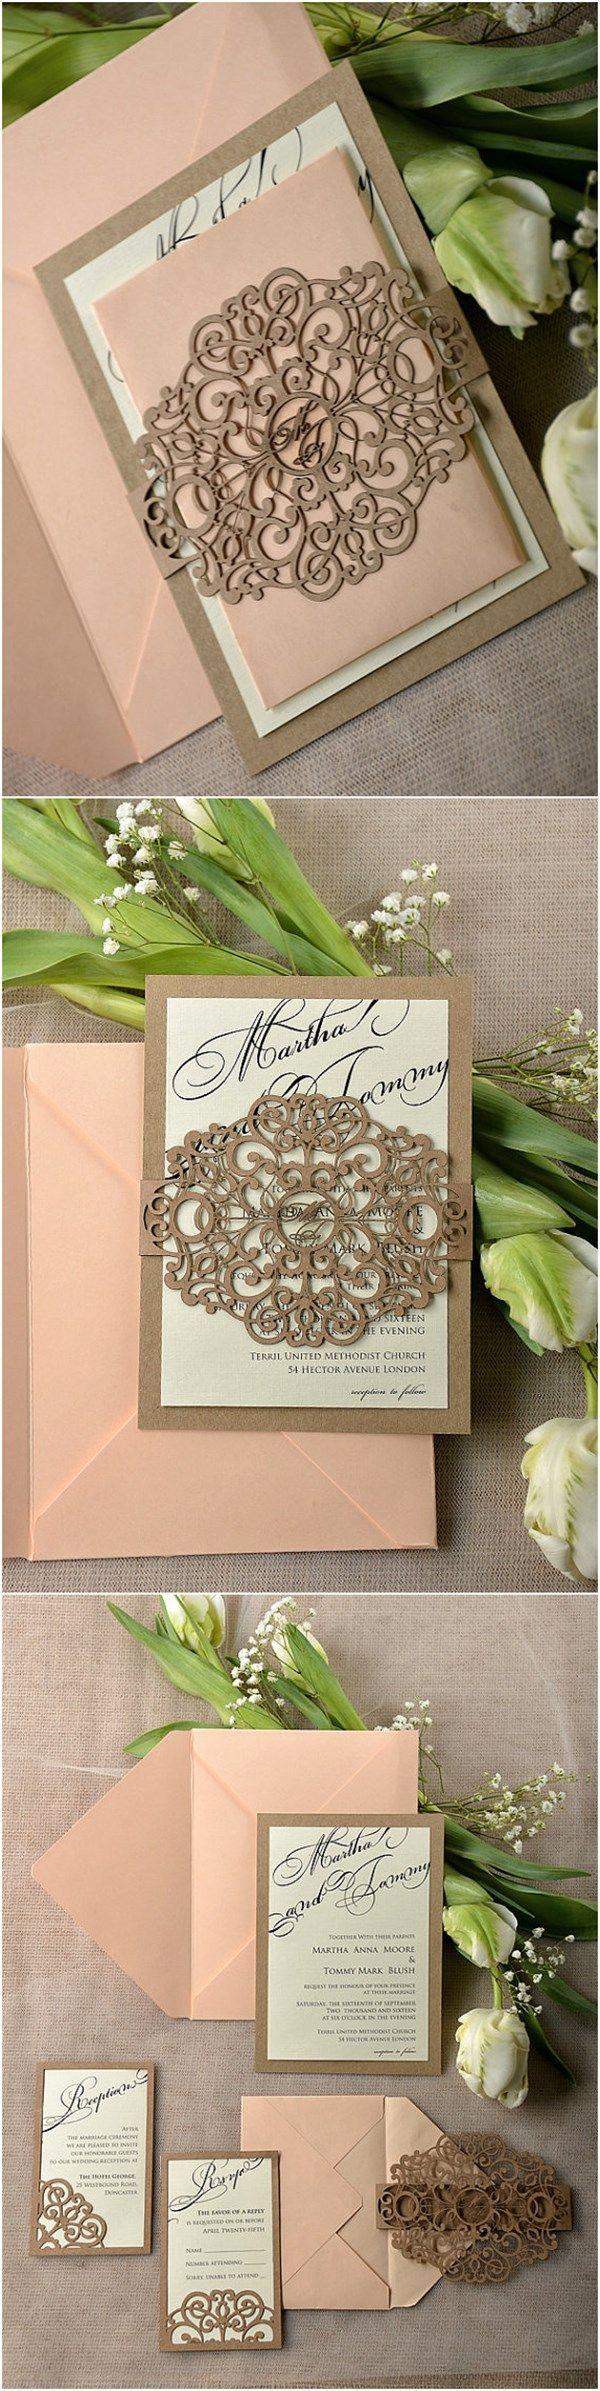 Rustic Peach Belly Laser Cut Band Wedding Invitation - Deer Pearl Flowers